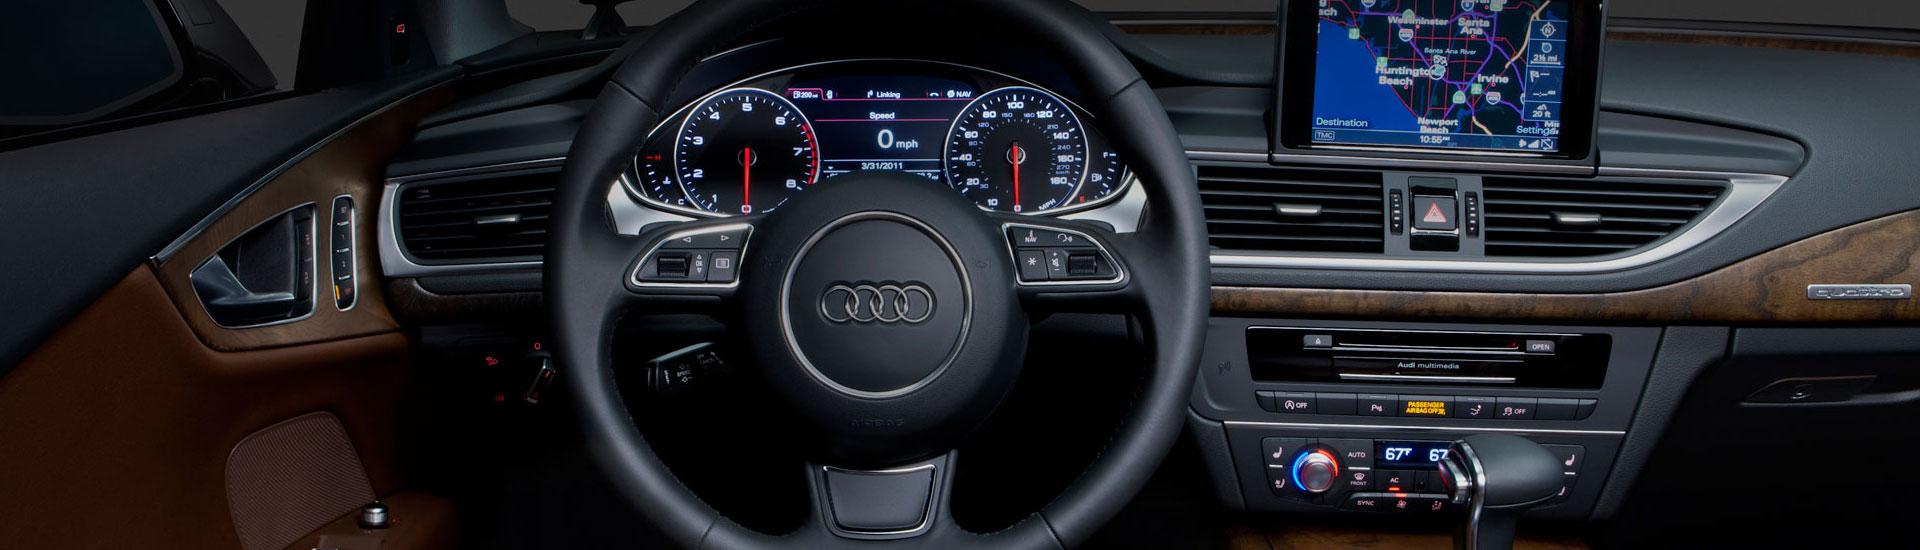 Audi A6 Dash Kits Custom Audi A6 Dash Kit